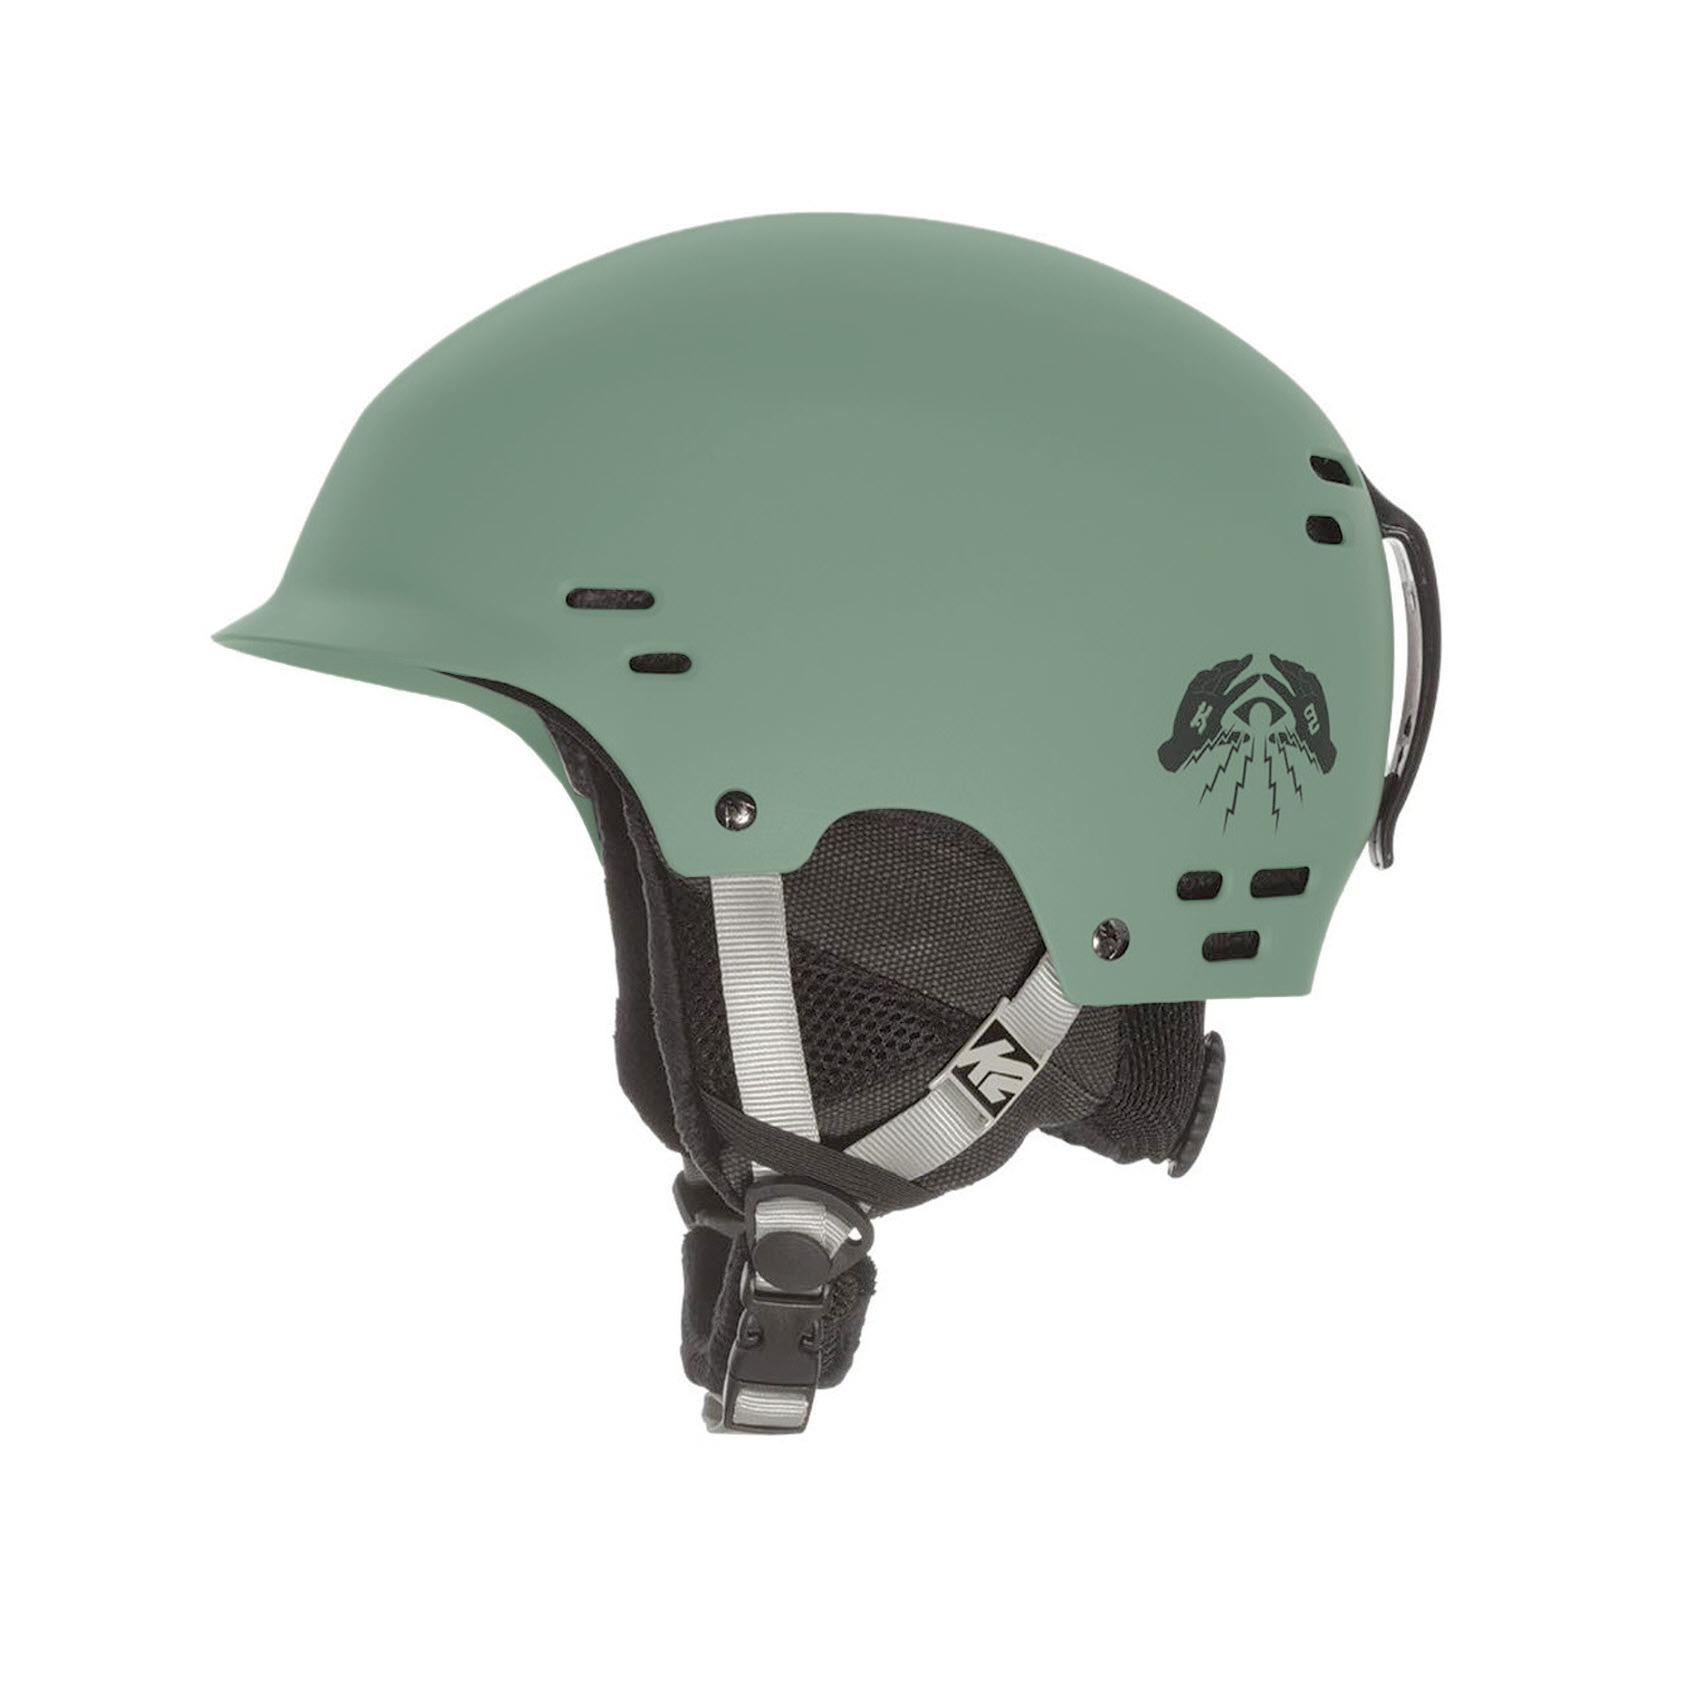 08f20d68d2e K2 Thrive Helmet 2017